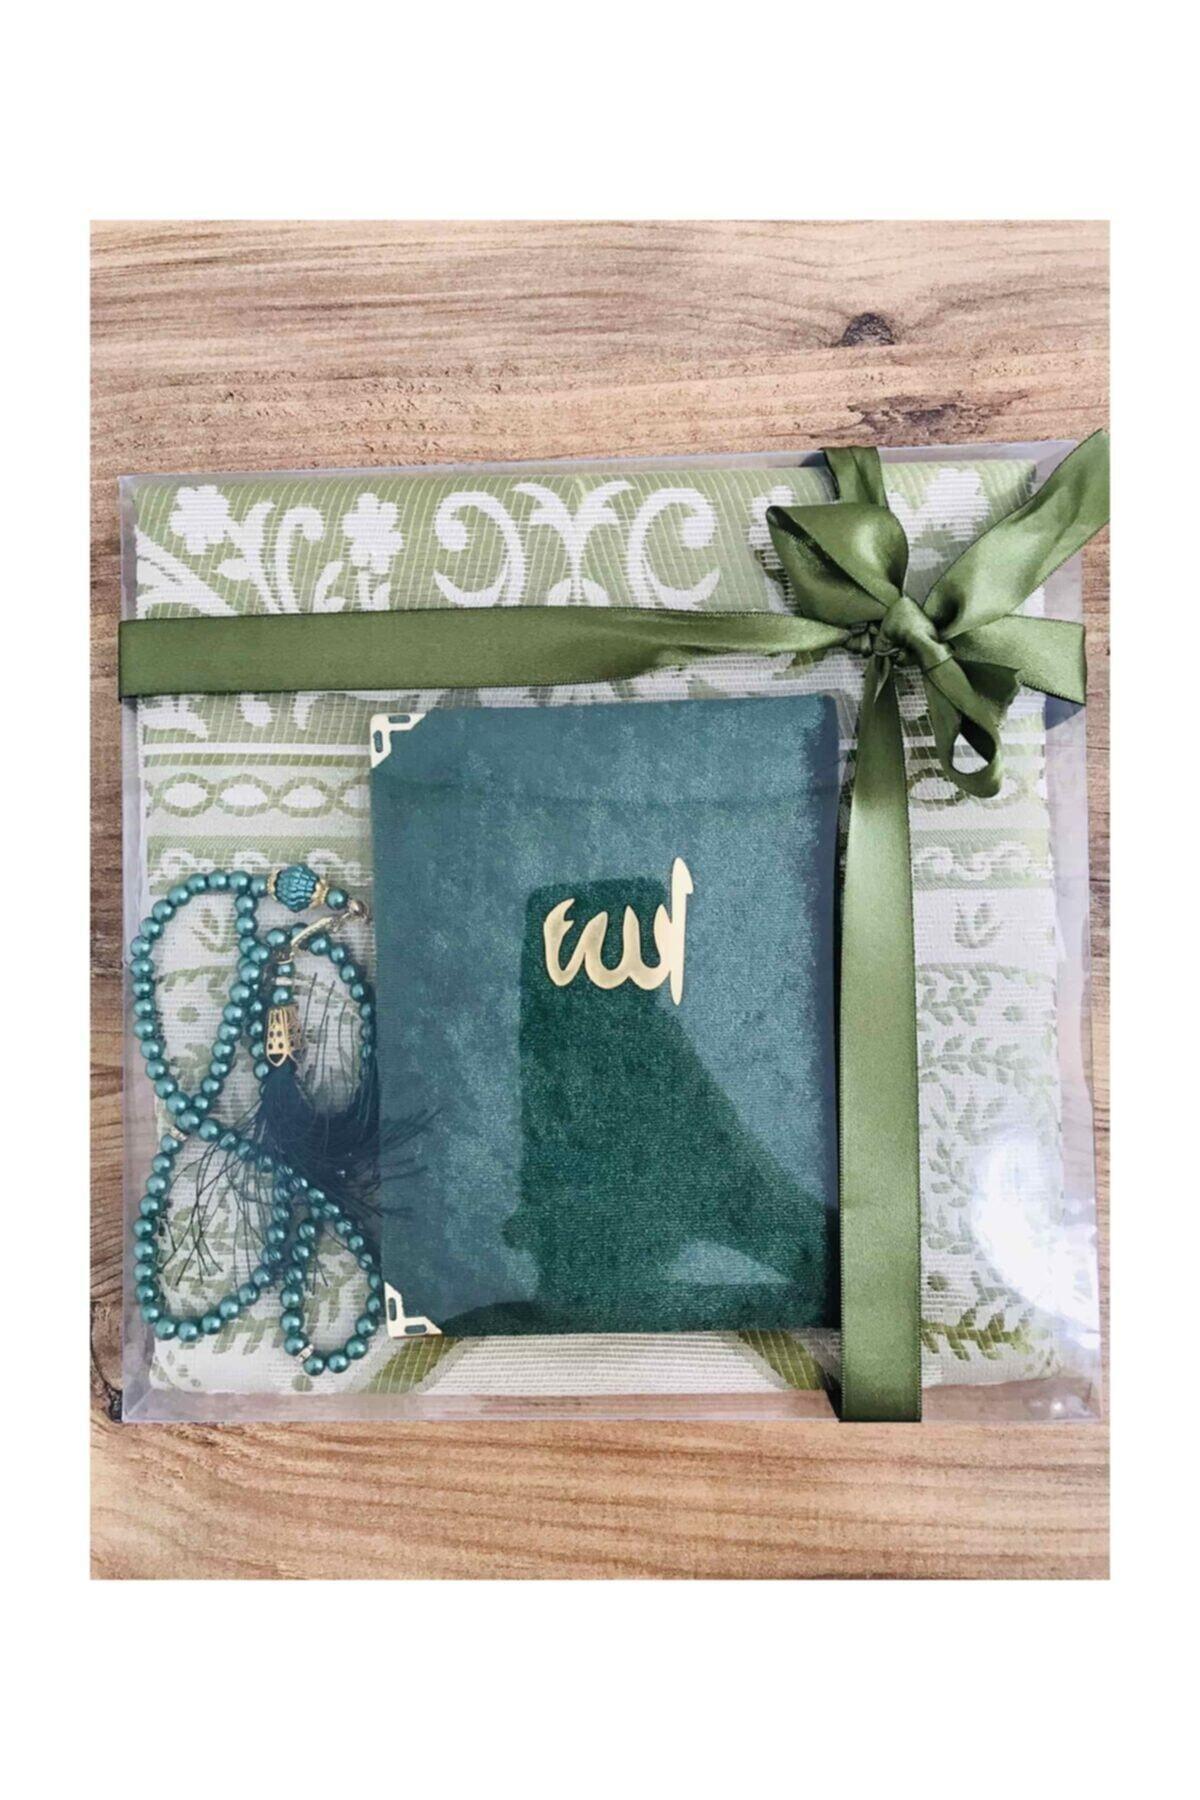 Prayer Rug Rosary Yaseen Book Gift Set (muslim islamic gift سجاد صلاة مسلم هدية إسلامية sijad salat muslim hadiat) mewlid Turkey